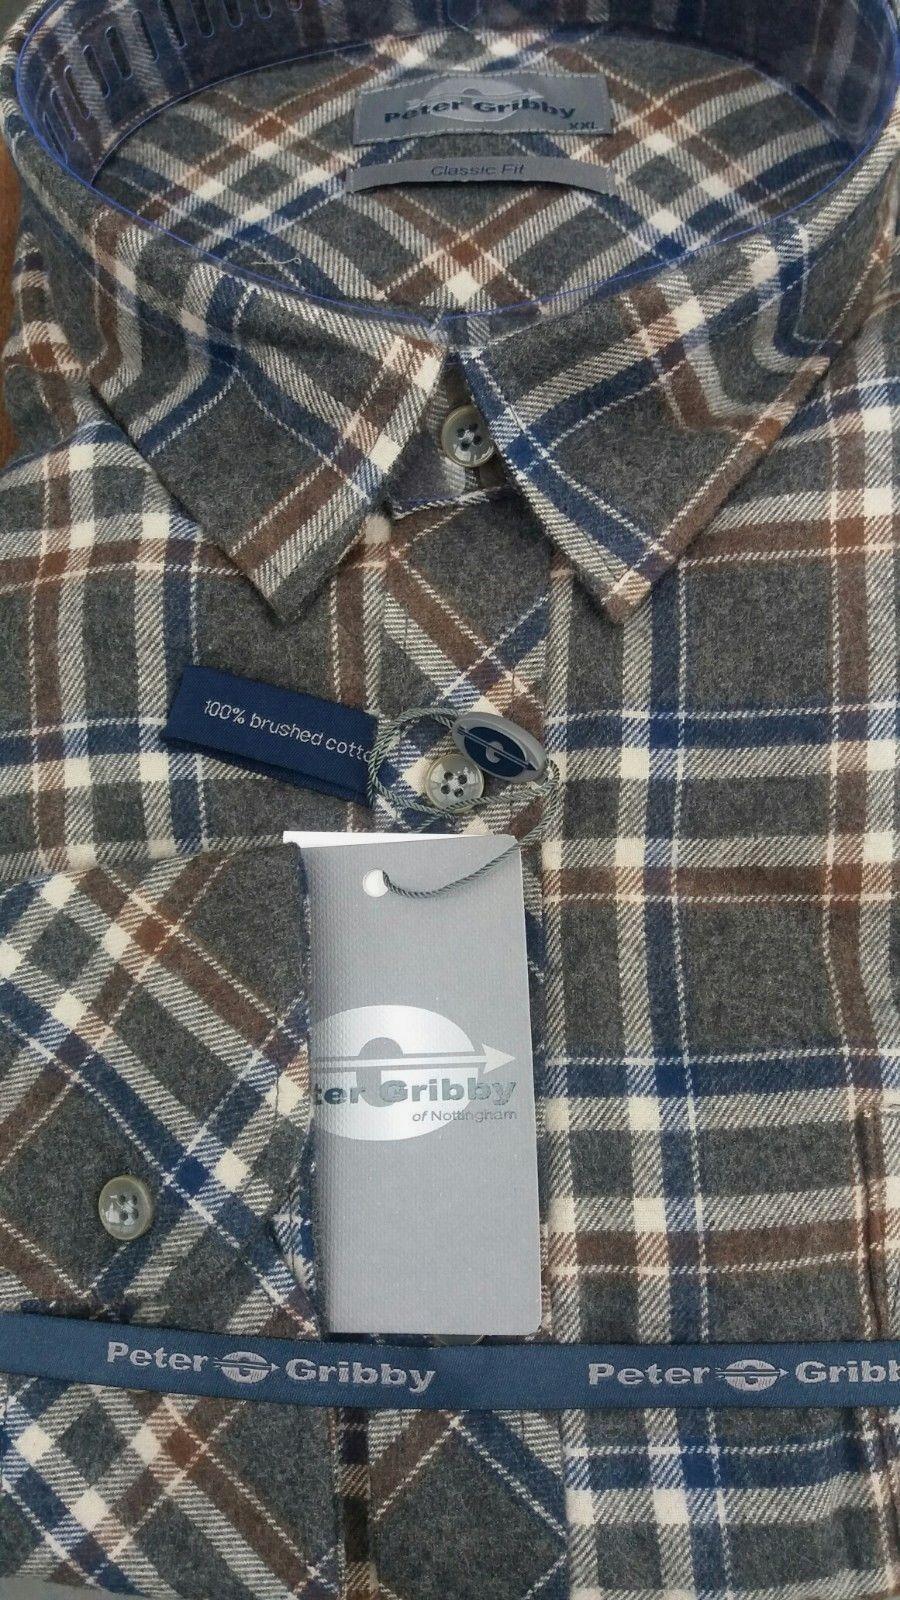 Peter gribby Toffee doppio spazzolato Camicia a maniche lunghe P18224 2XL3XL4XL5XL6XL7XL8XL